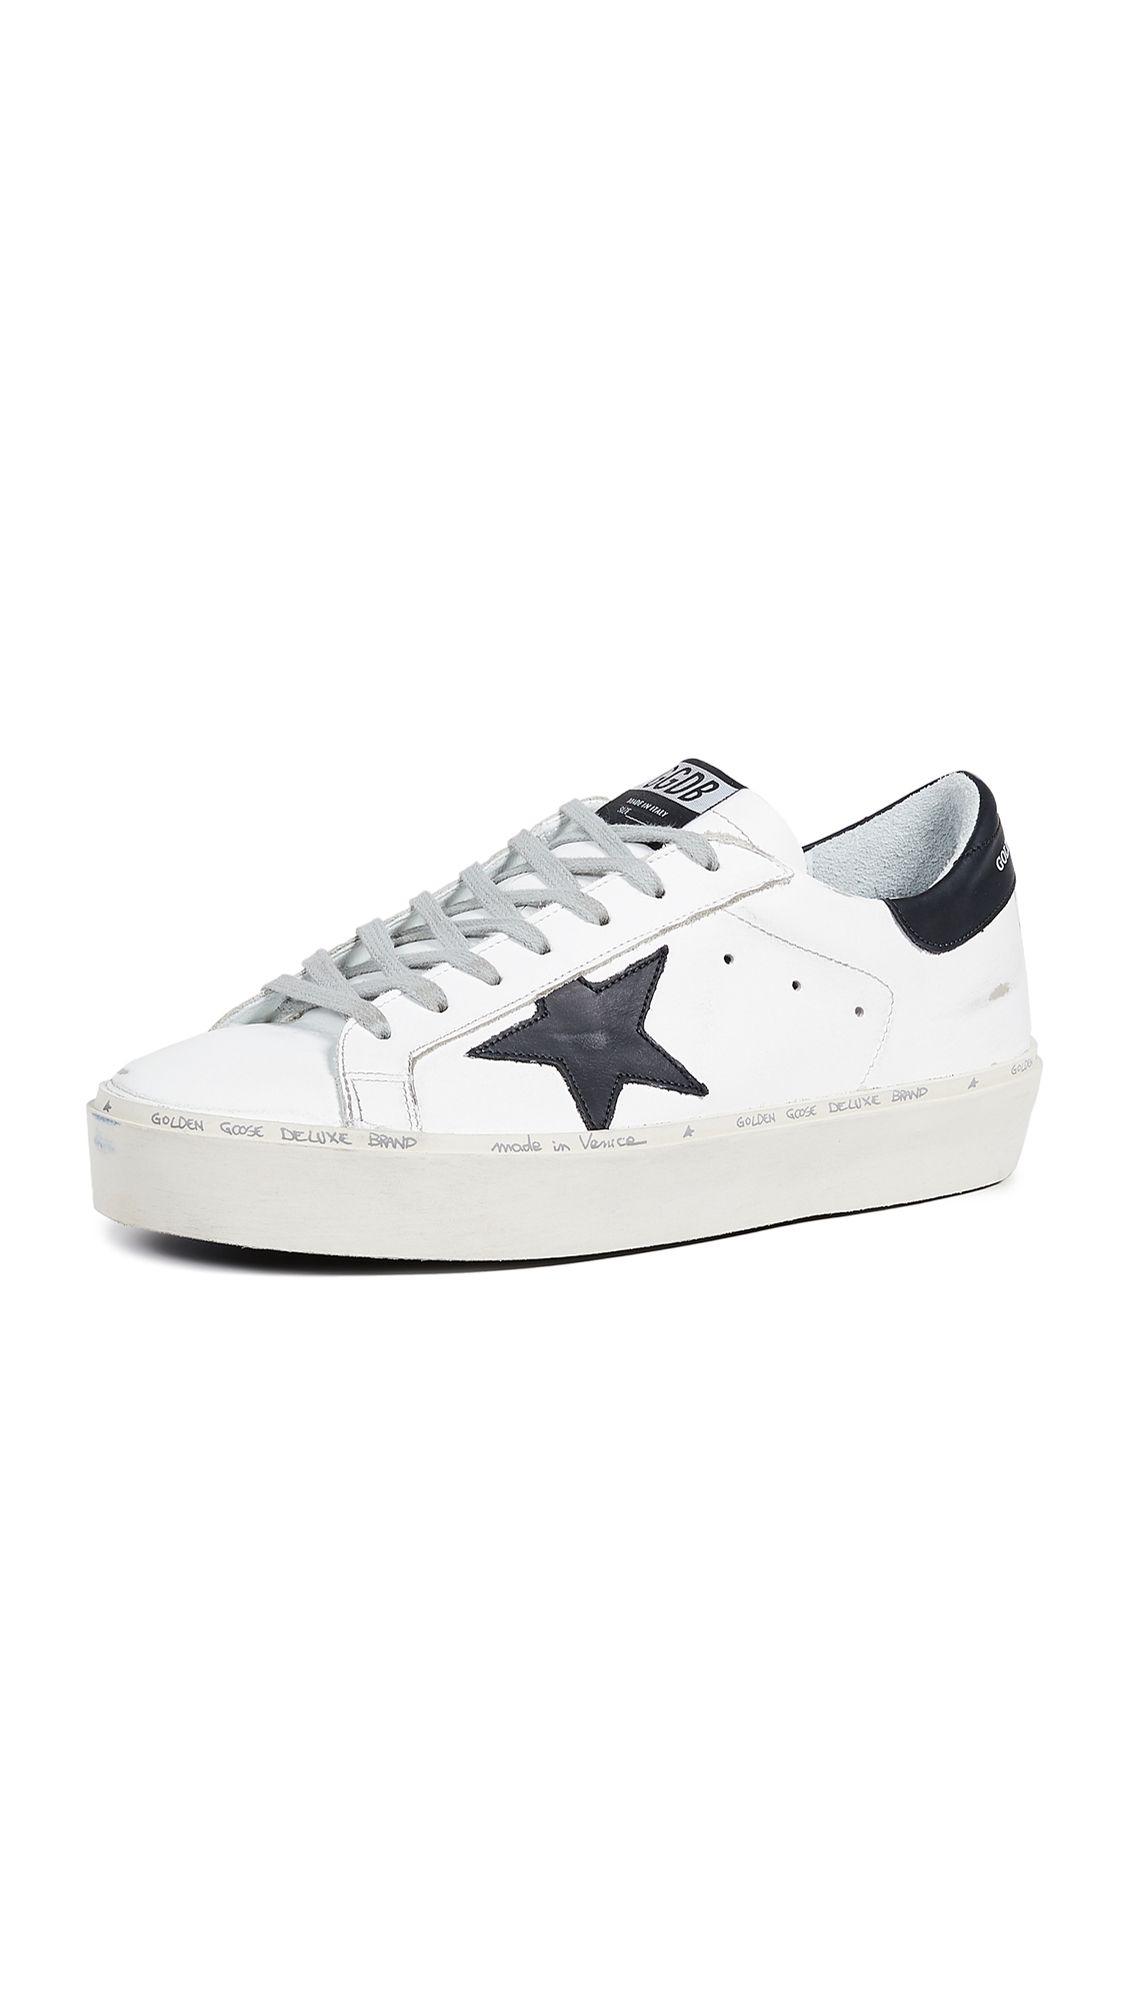 Golden Goose Hi Star Sneakers In White